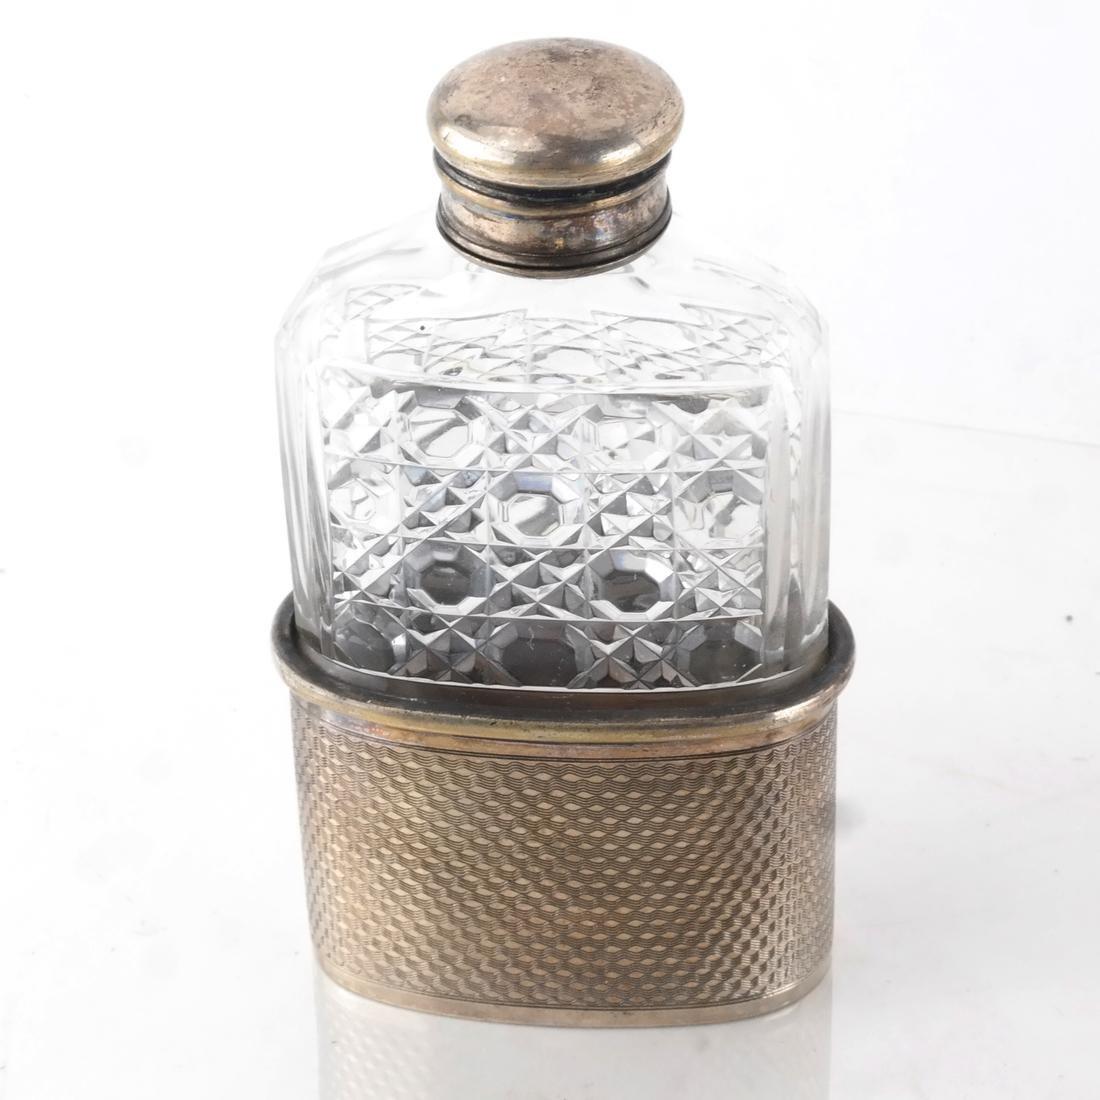 Asst. Silver Pin Trays, Receivers, Flasks - 6